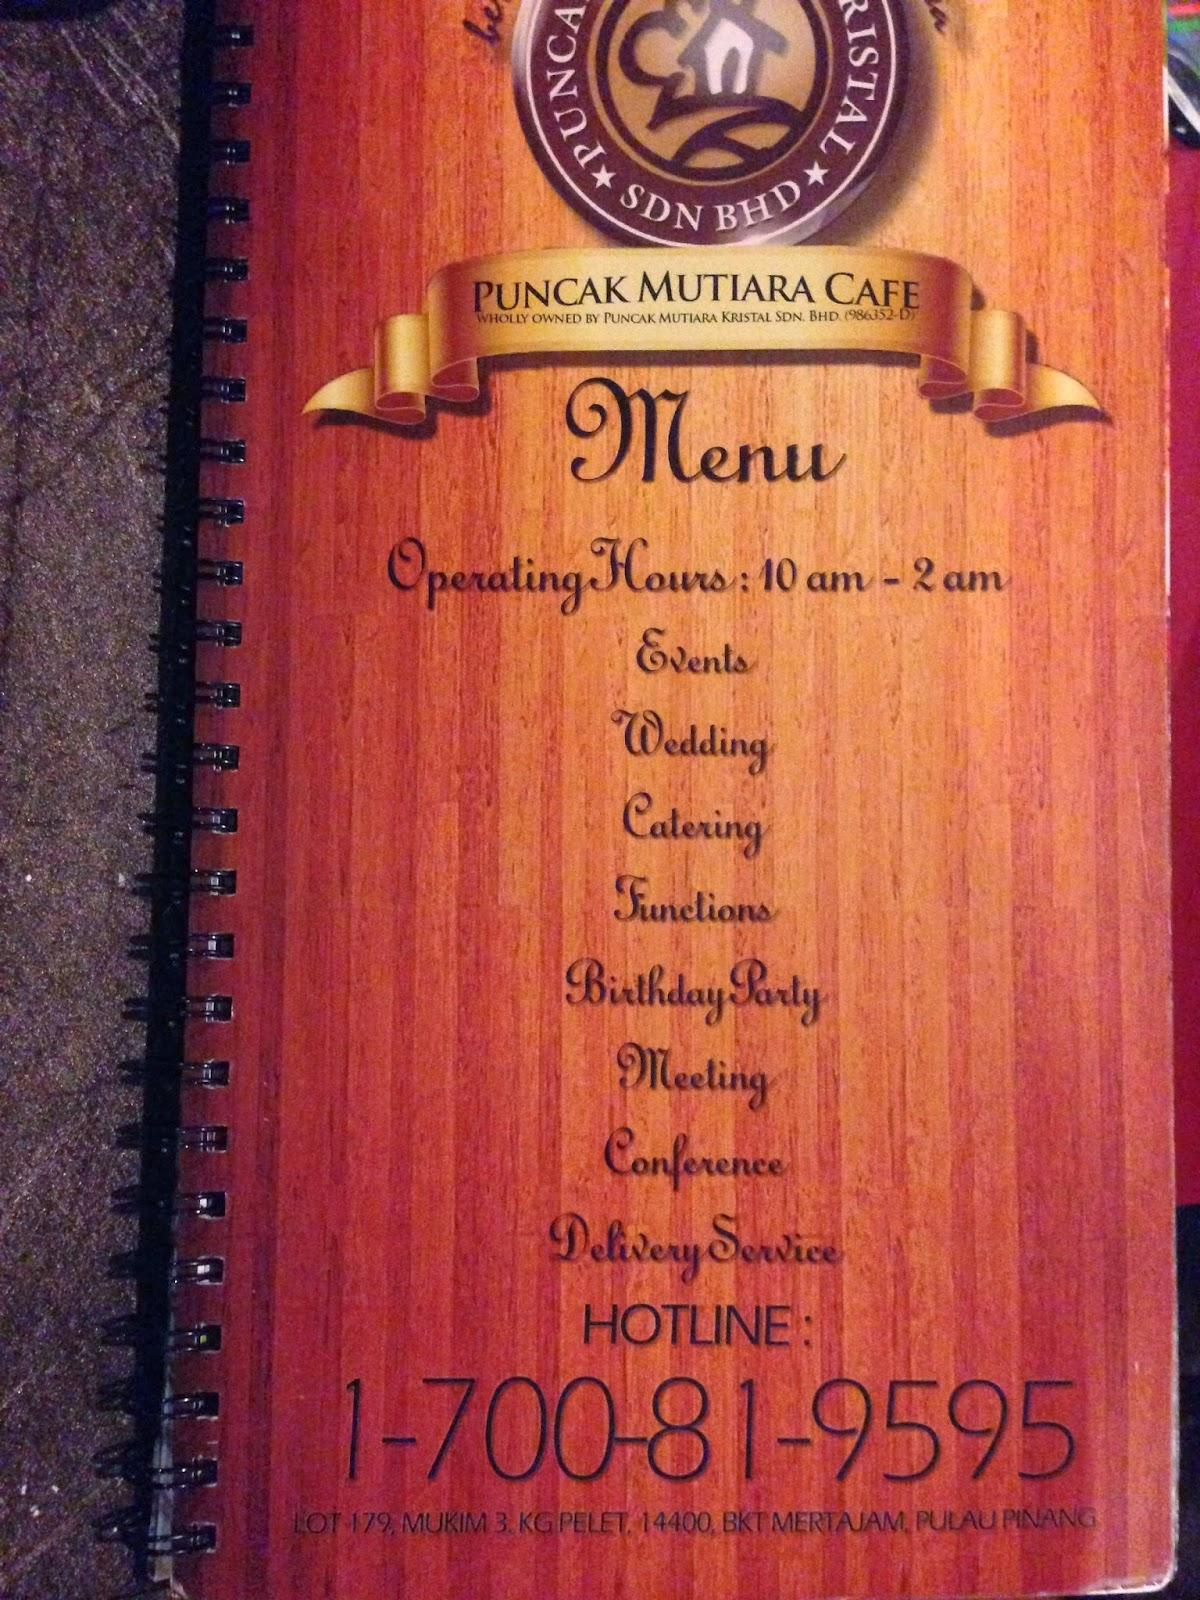 Puncak Mutiara Cafe Info